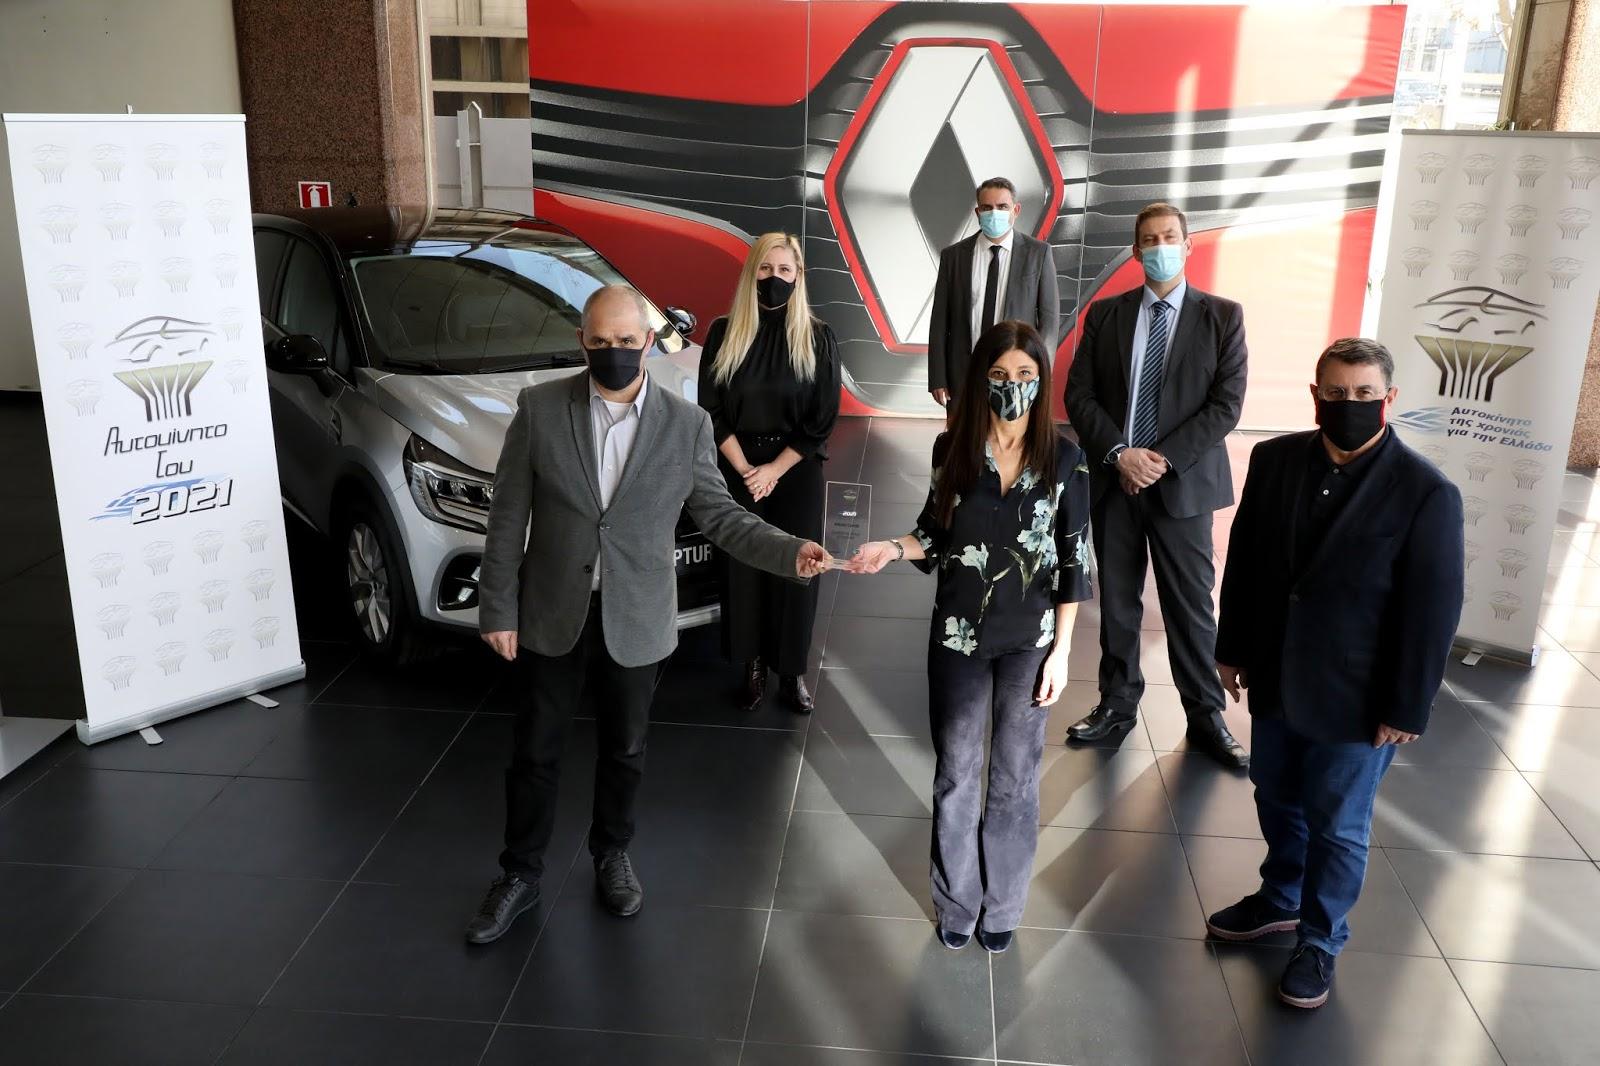 2021 renault captur 1355778963 «Αυτοκίνητο του 2021» : Απονομή του βραβείου για το νέο Renault Captur